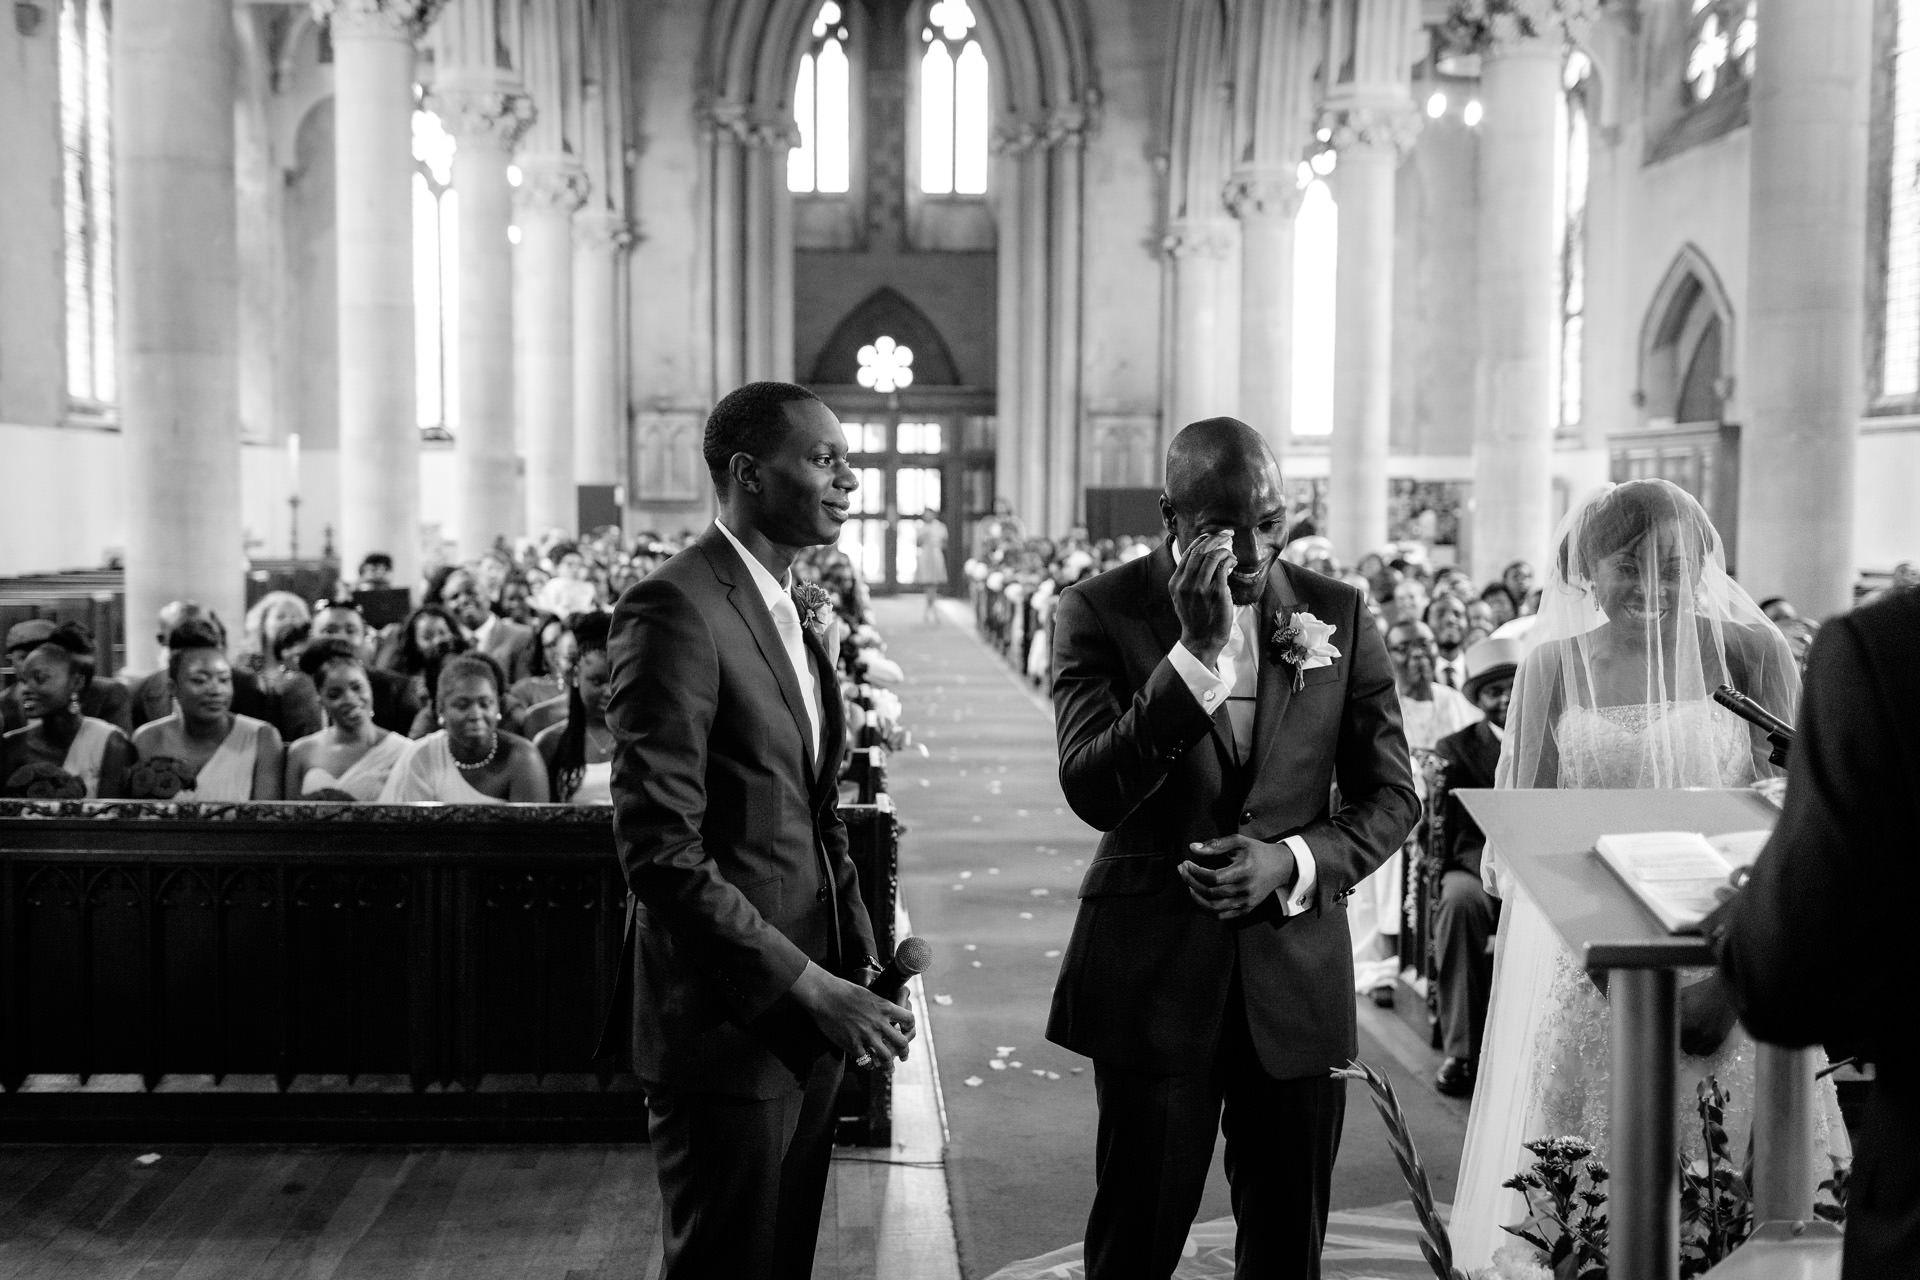 nigerian wedding photography in the church in london